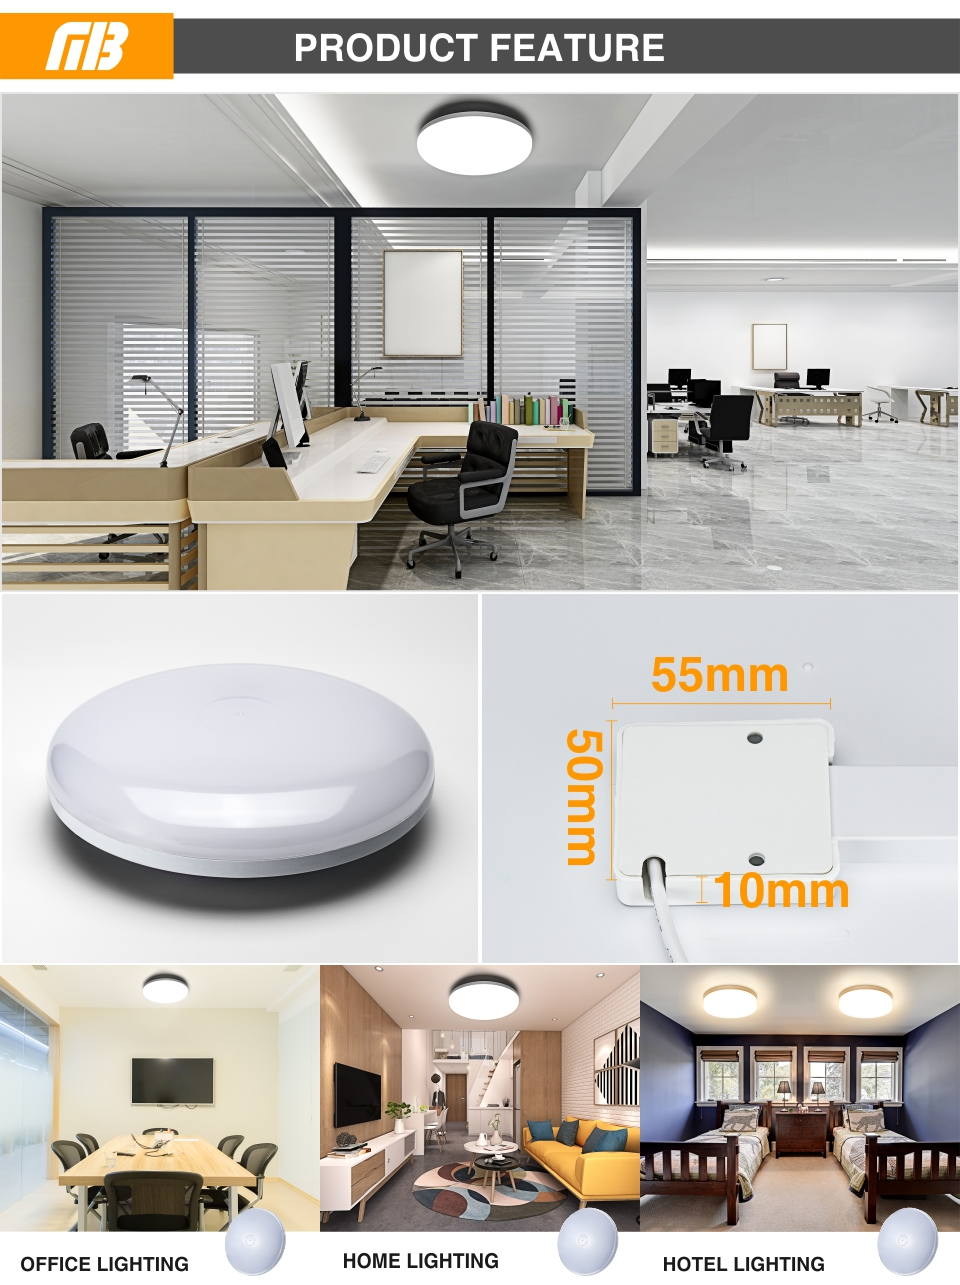 HTB1mSzkRhjaK1RjSZFAq6zdLFXaO Ultra Thin LED Ceiling Lamp LED Modern Panel Light 48W 36W 24W 18W 9W 6W 85-265V Bedroom Kitchen Surface Mount Flush Panel Light